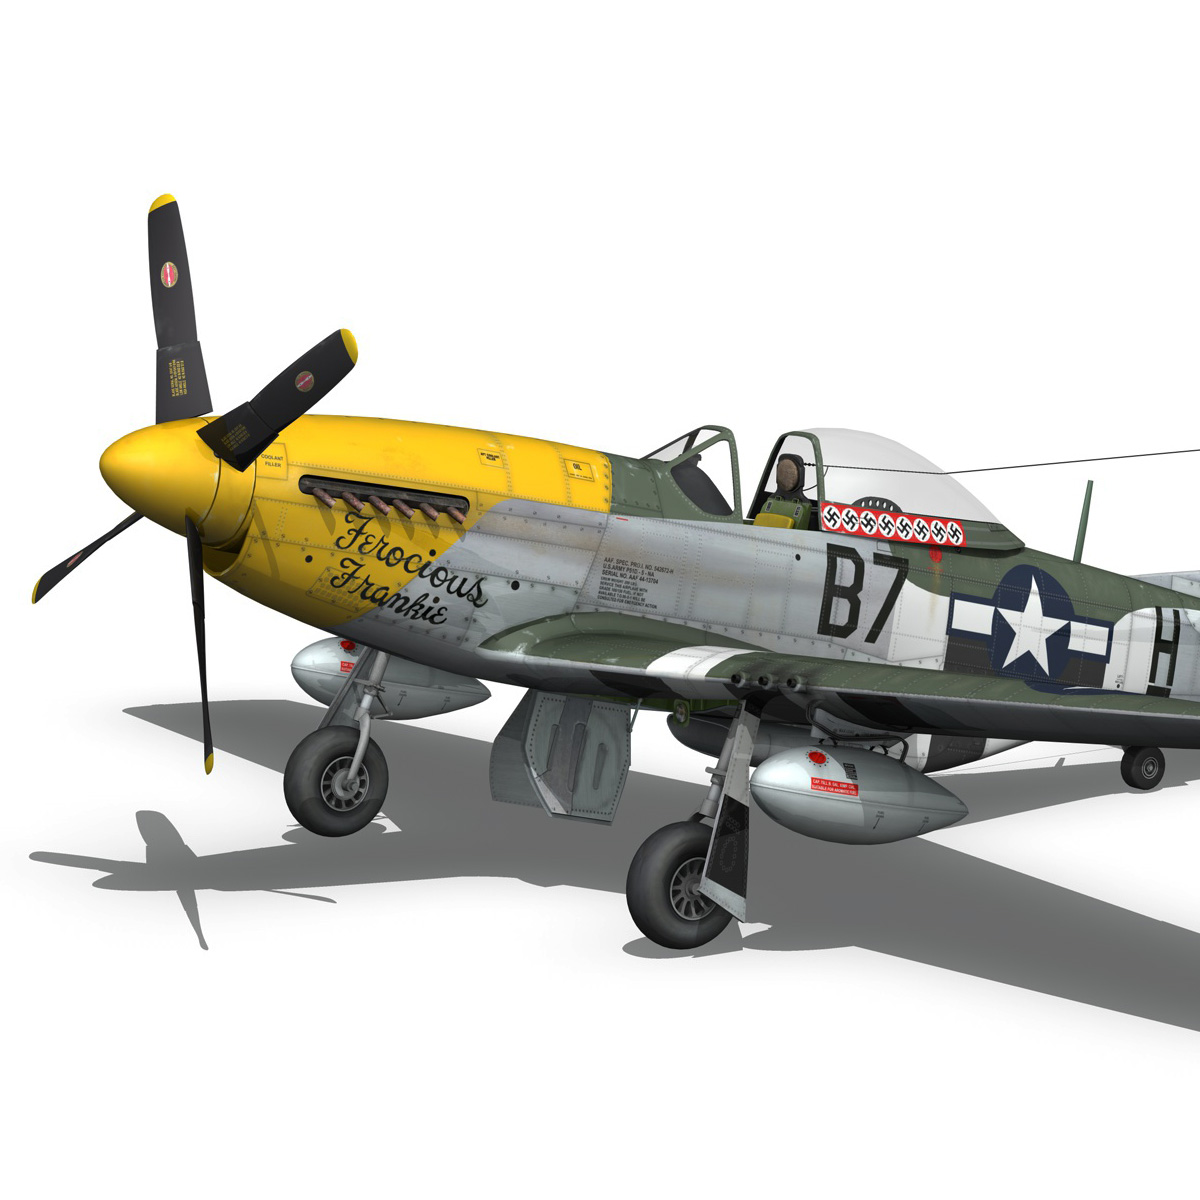 north american p-51d mustang – ferocious frankie 3d model fbx c4d lwo obj 269495